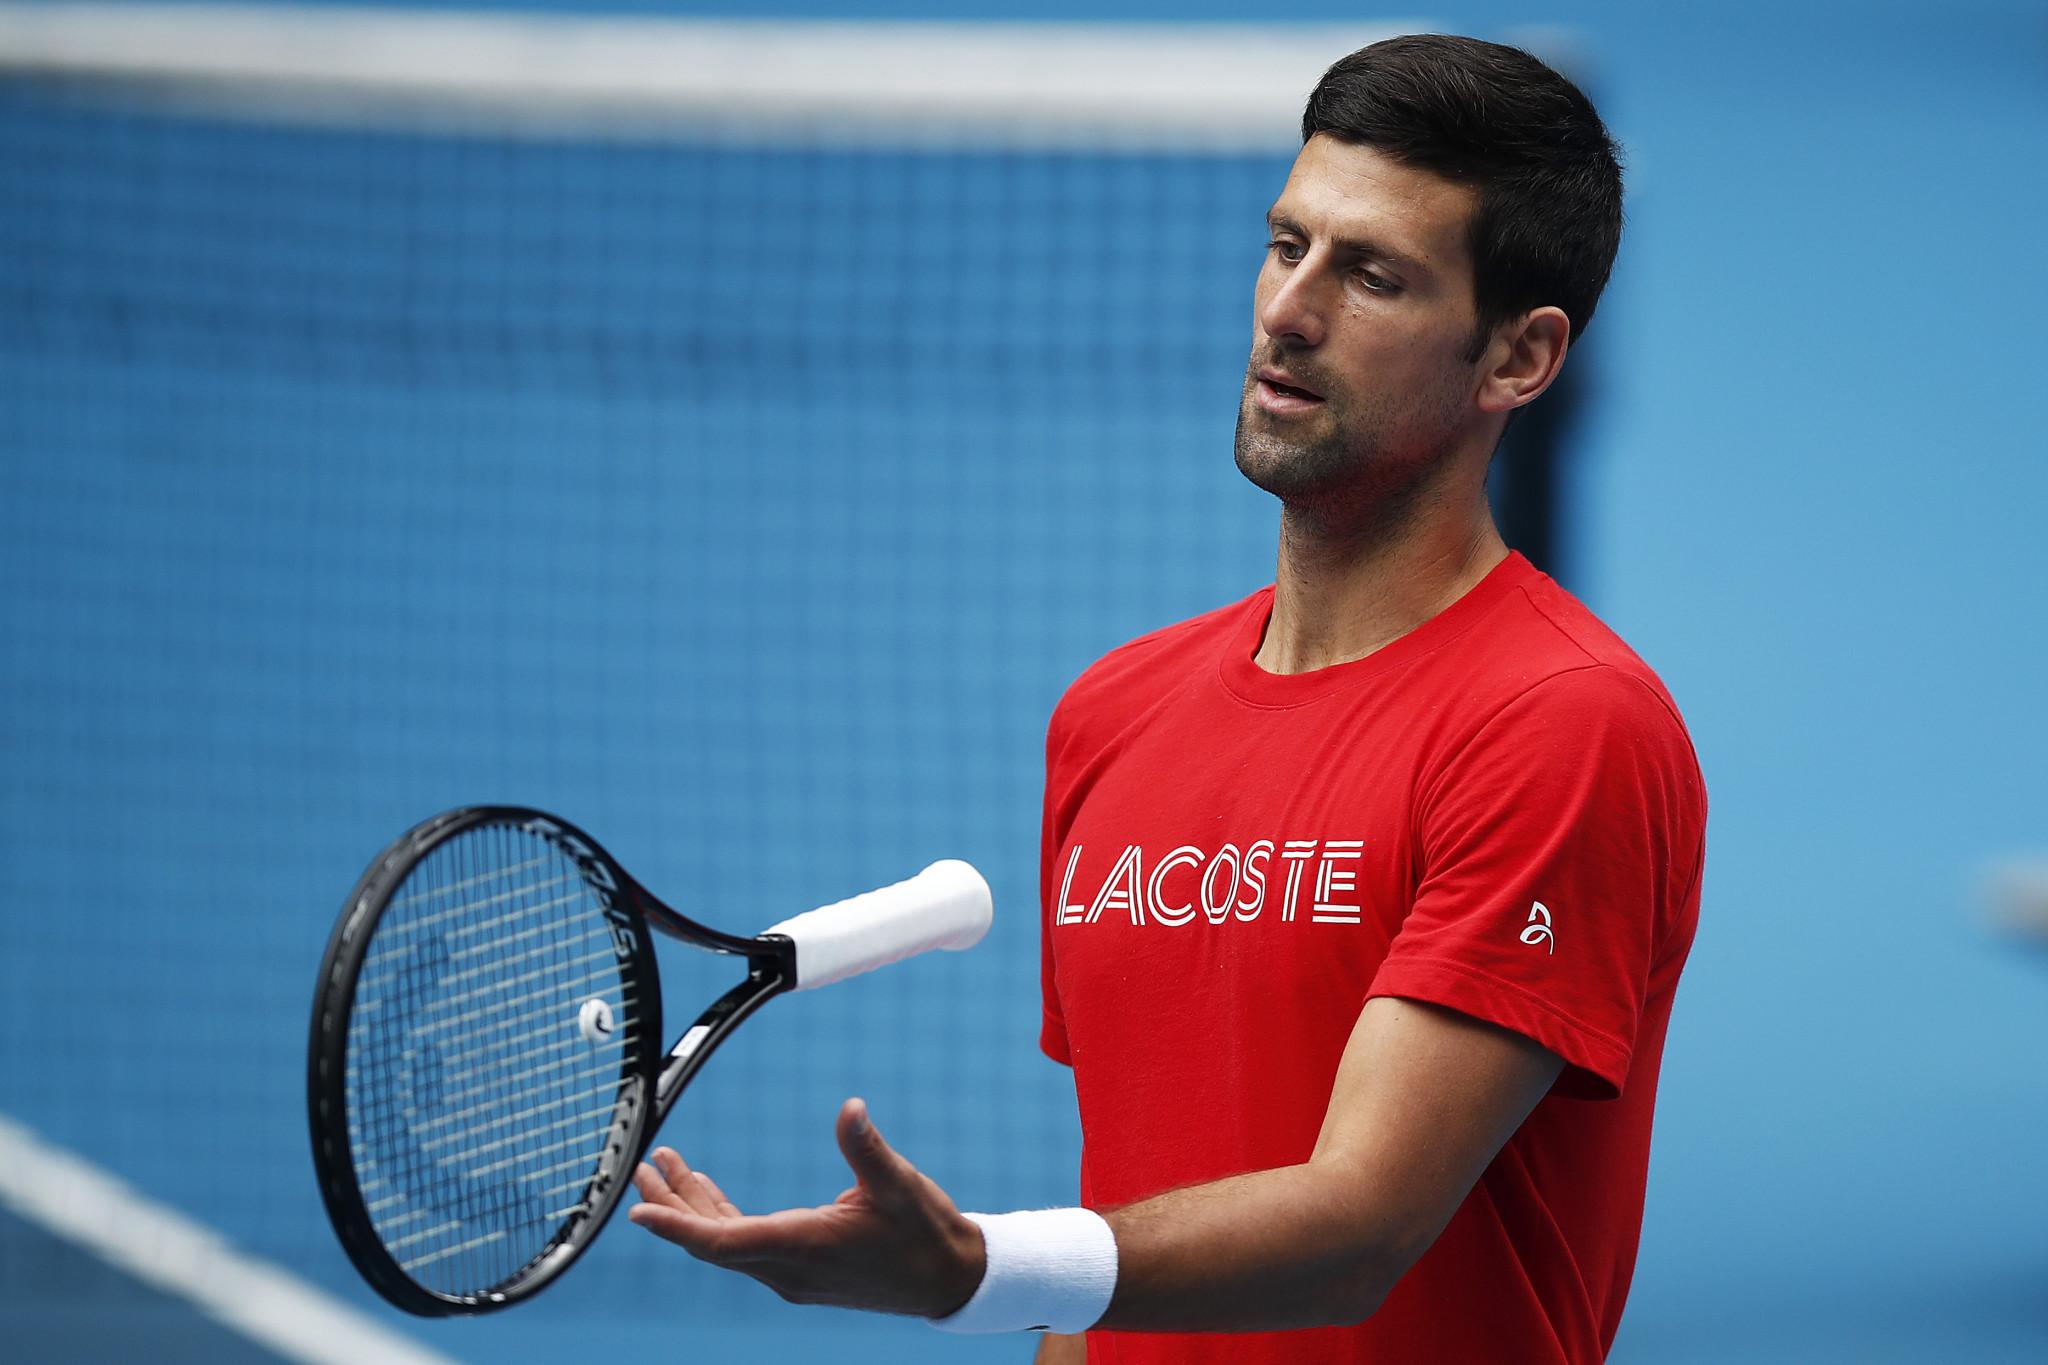 Racket sponsor Head caught in gaffe after congratulating Djokovic for Australian Open victory